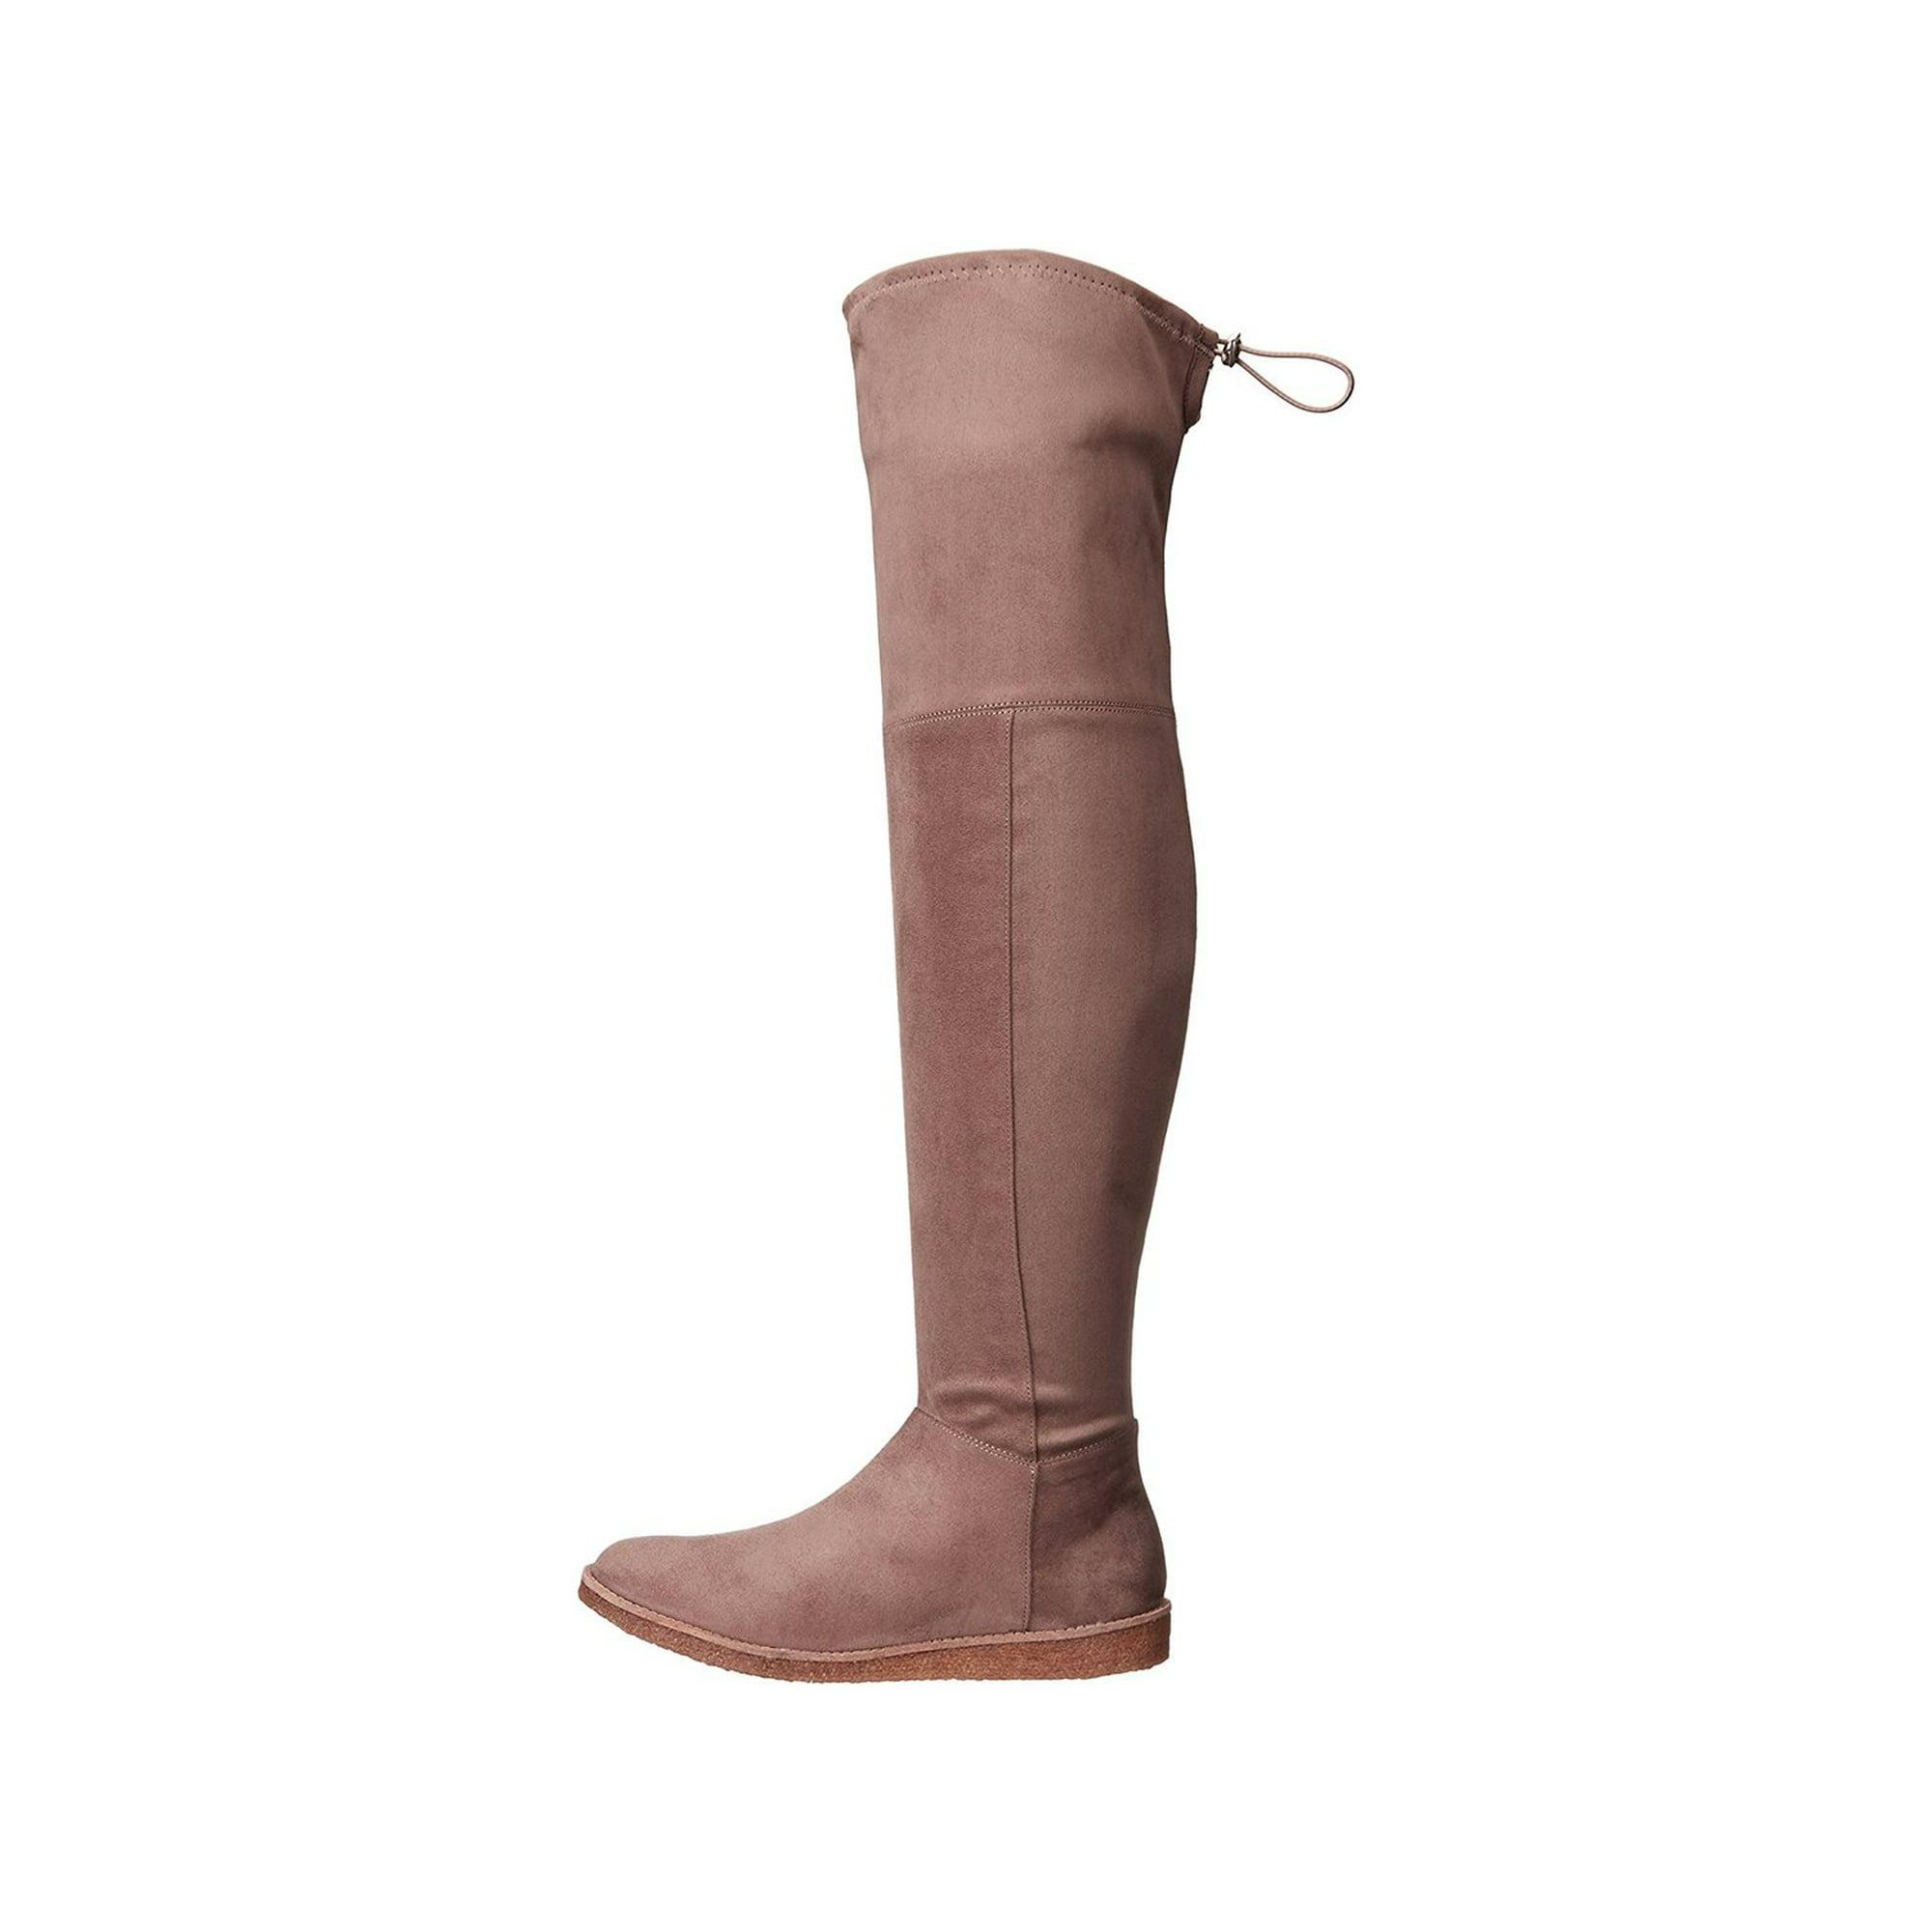 5e6d55d432e BCBGeneration Womens Brennan Closed Toe Over Knee Fashion Boots ...